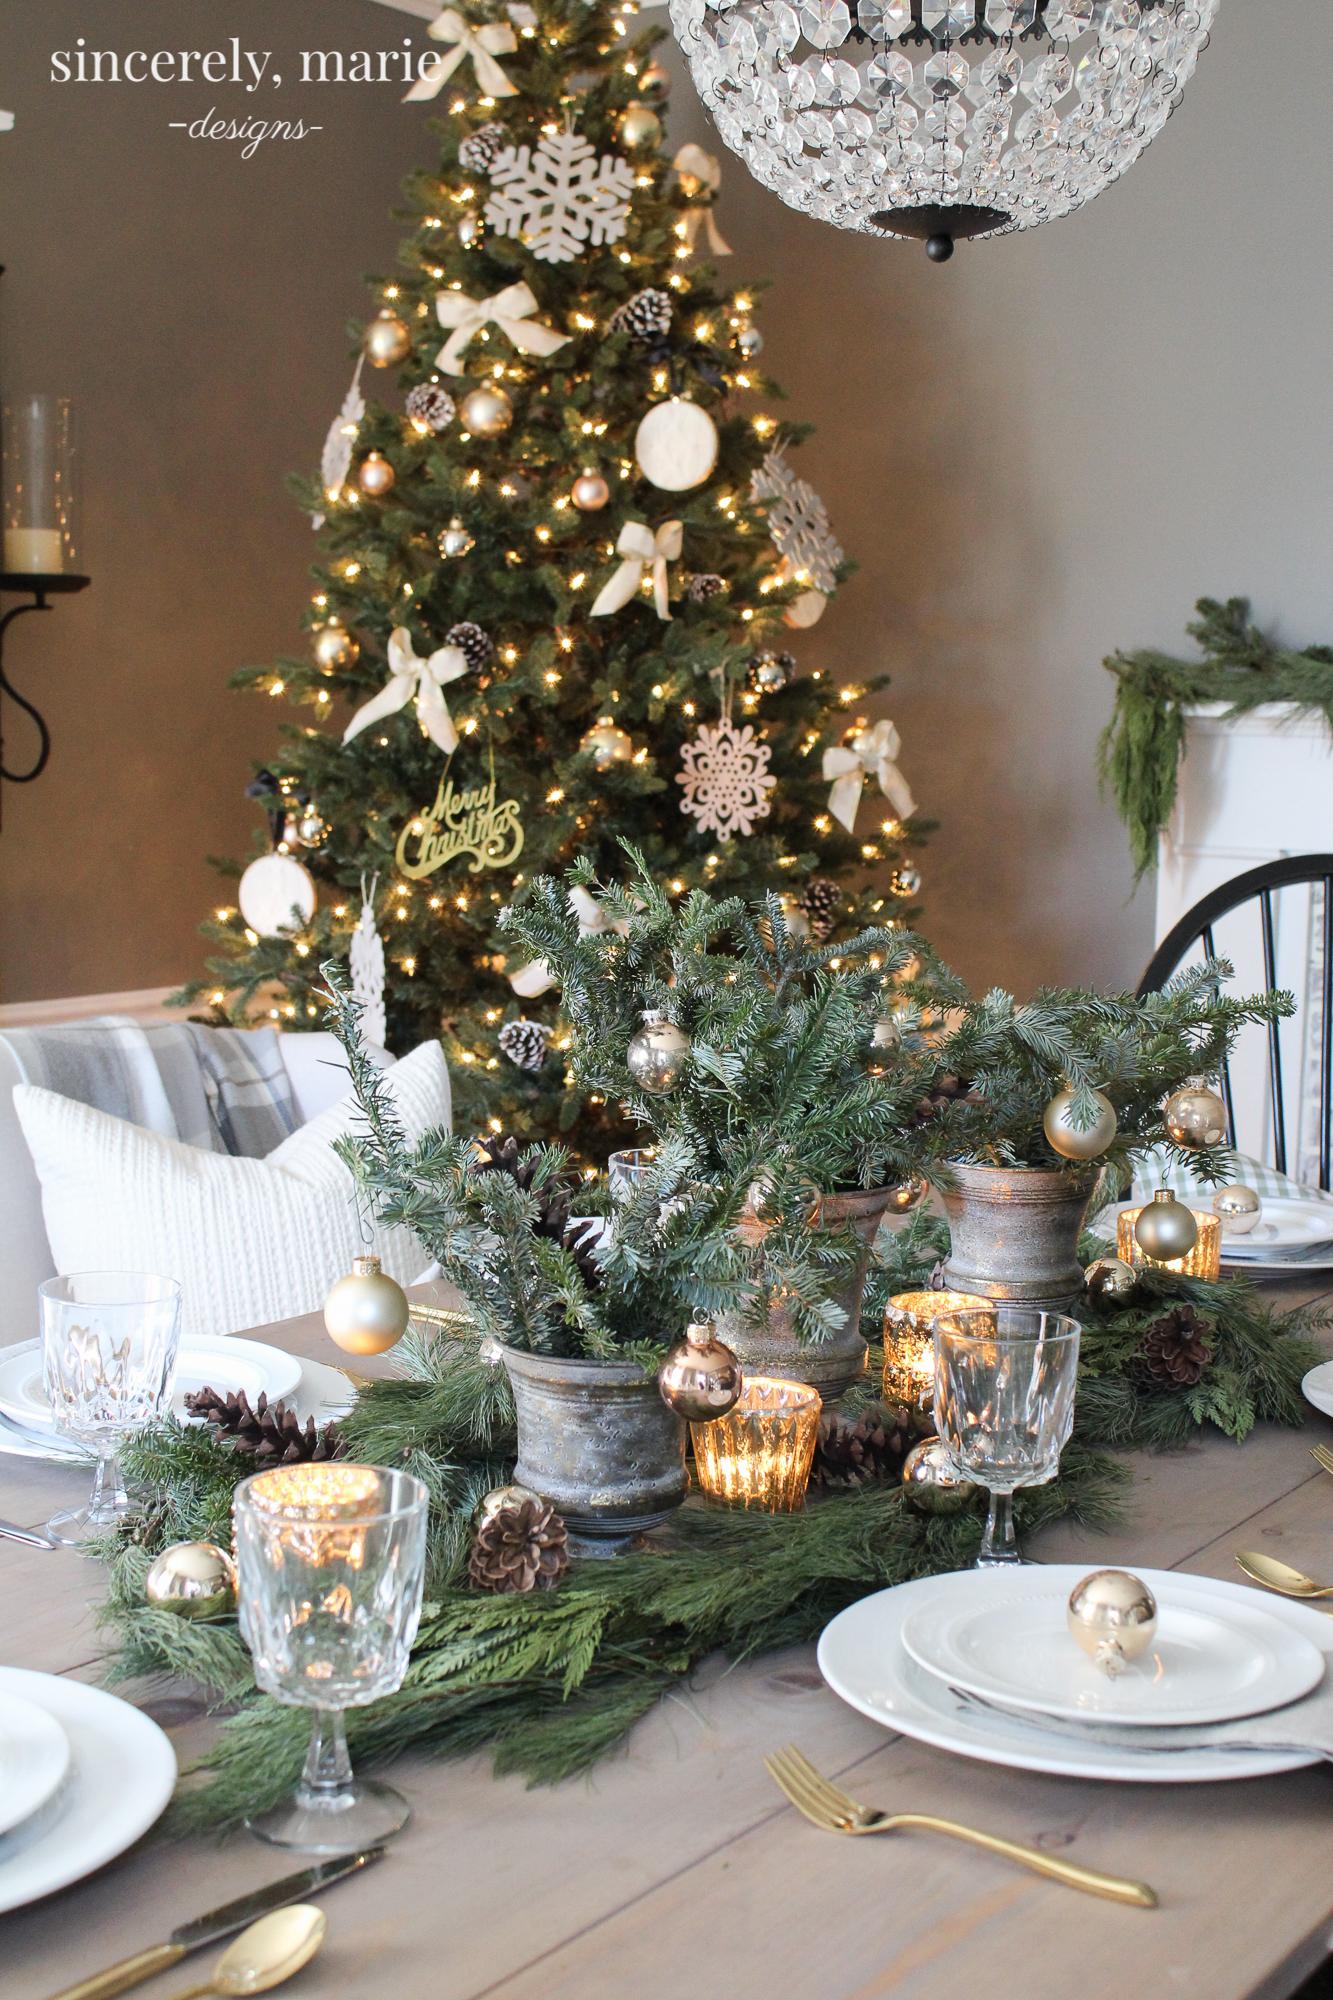 An Elegant Christmas Tablescape